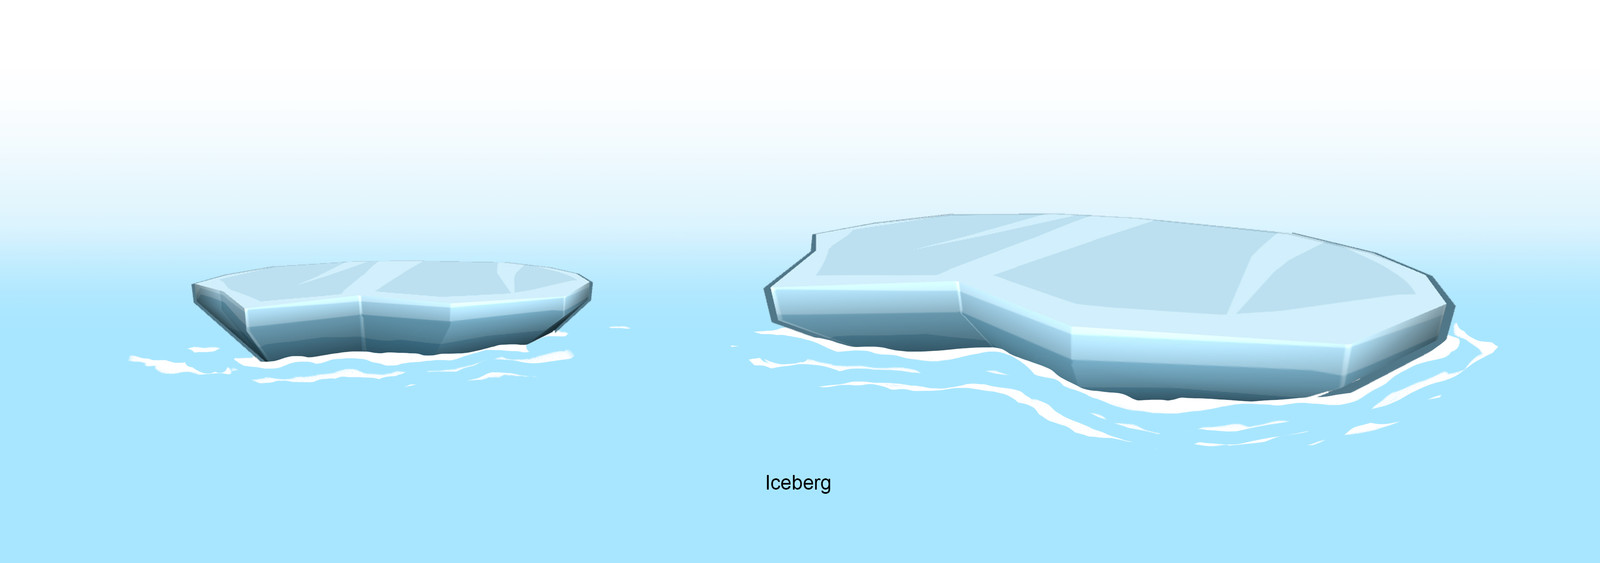 Iceberg Model and texture